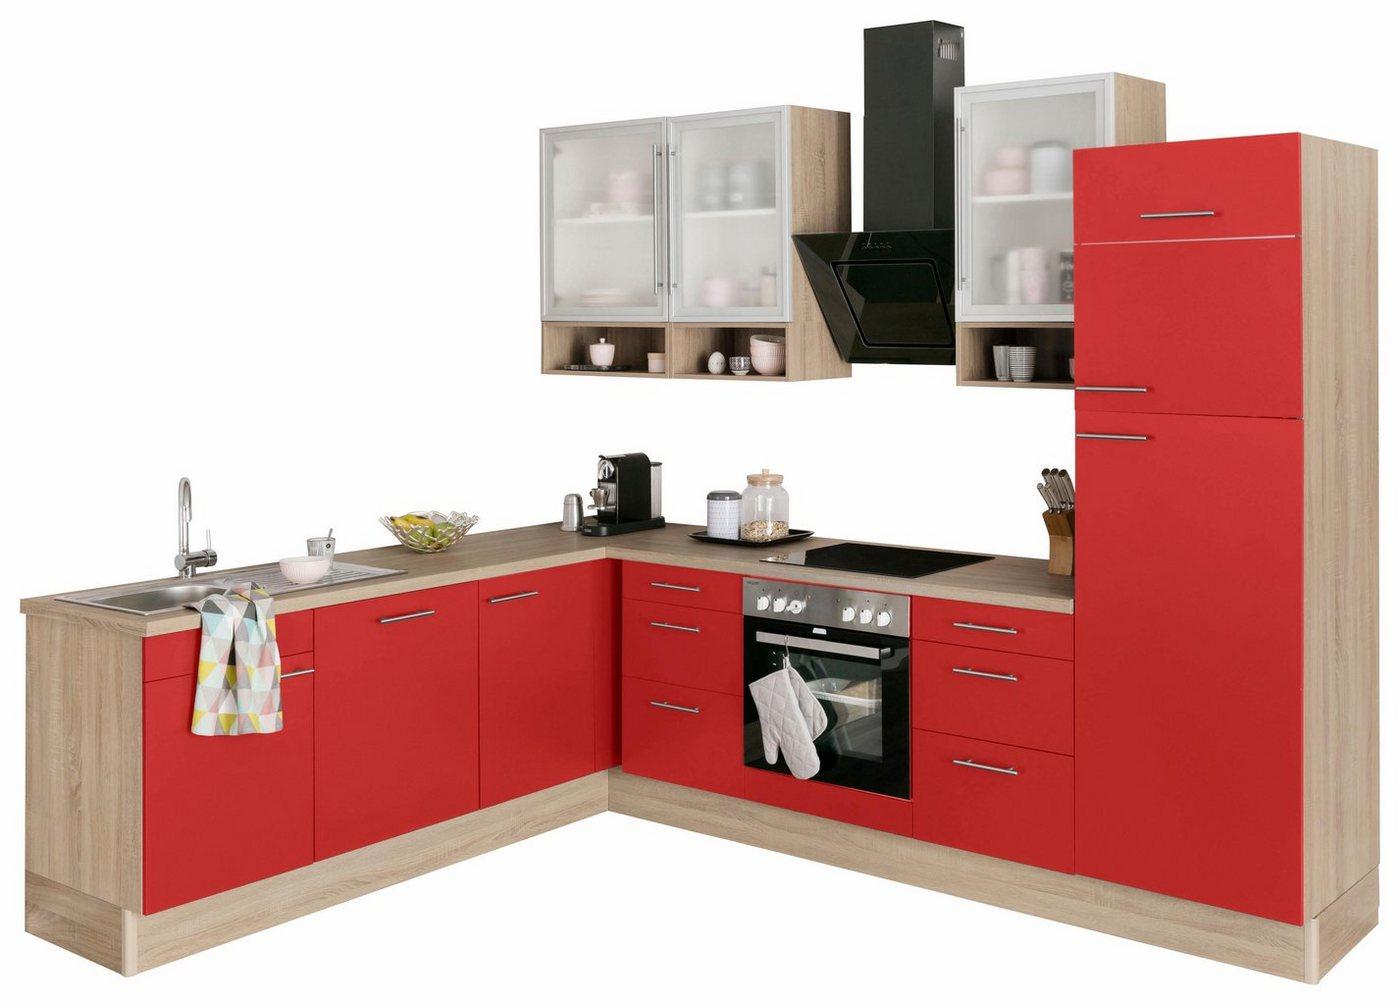 winkelk chen sonstige optifit preisvergleiche. Black Bedroom Furniture Sets. Home Design Ideas